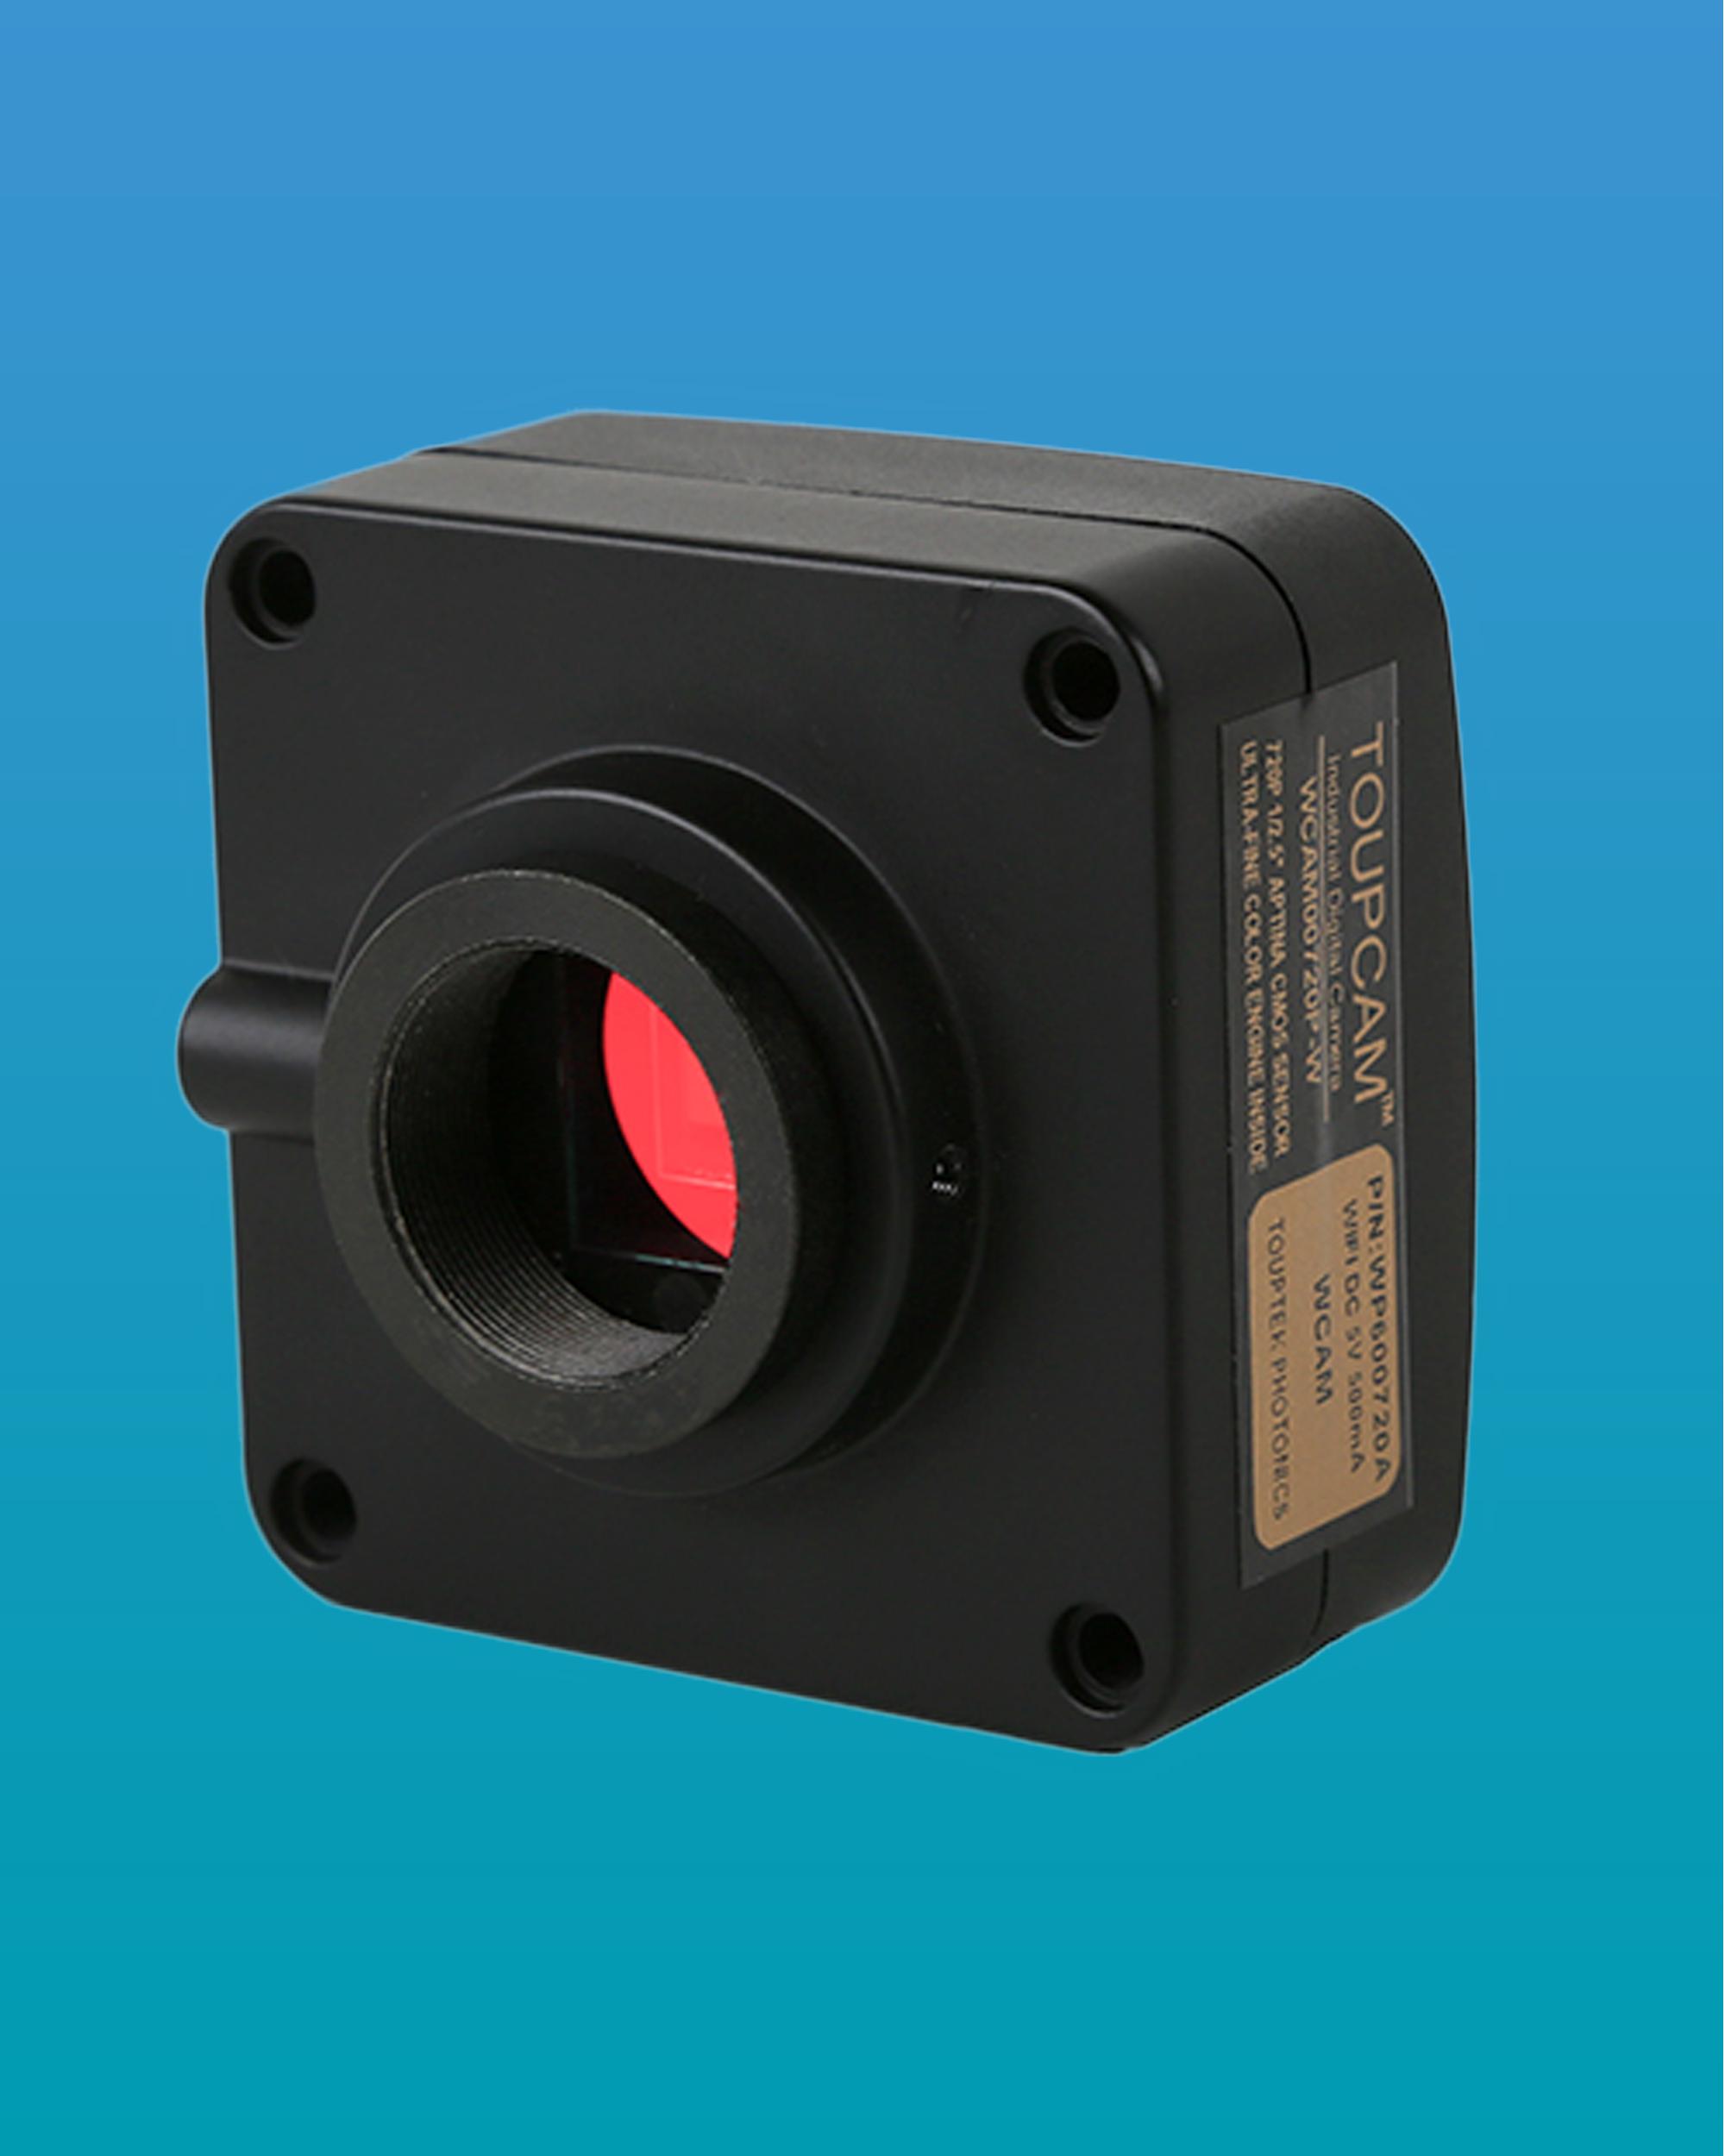 [LC-5] 1080P C-mount WiFi CMOS Camera